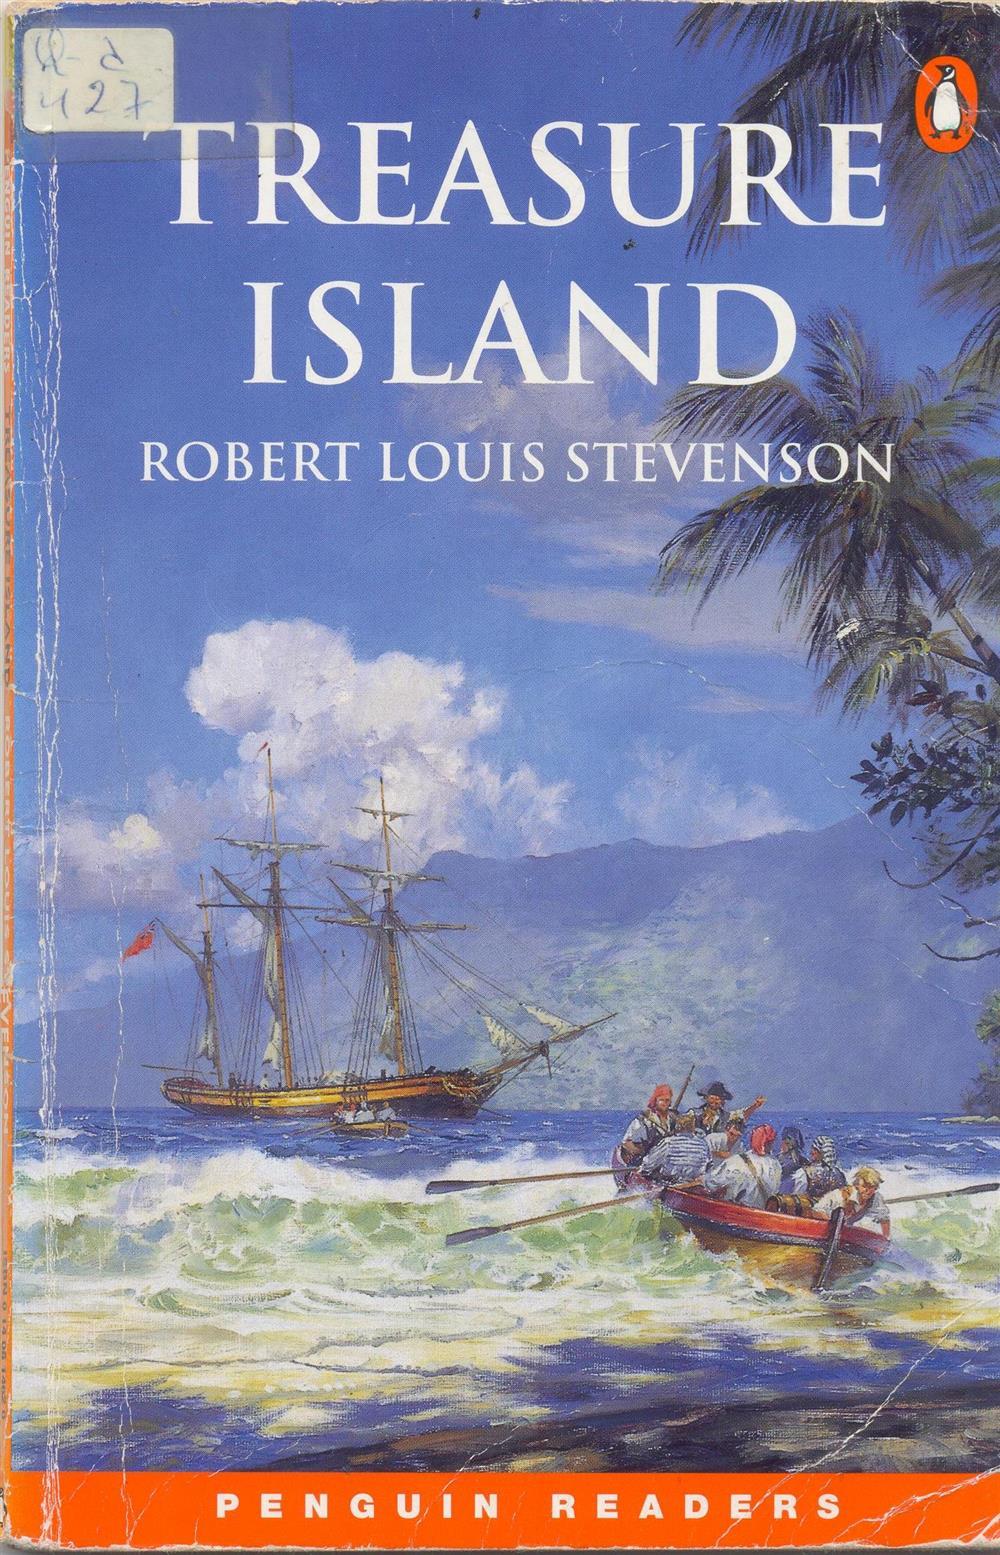 Treasure island 001.jpg